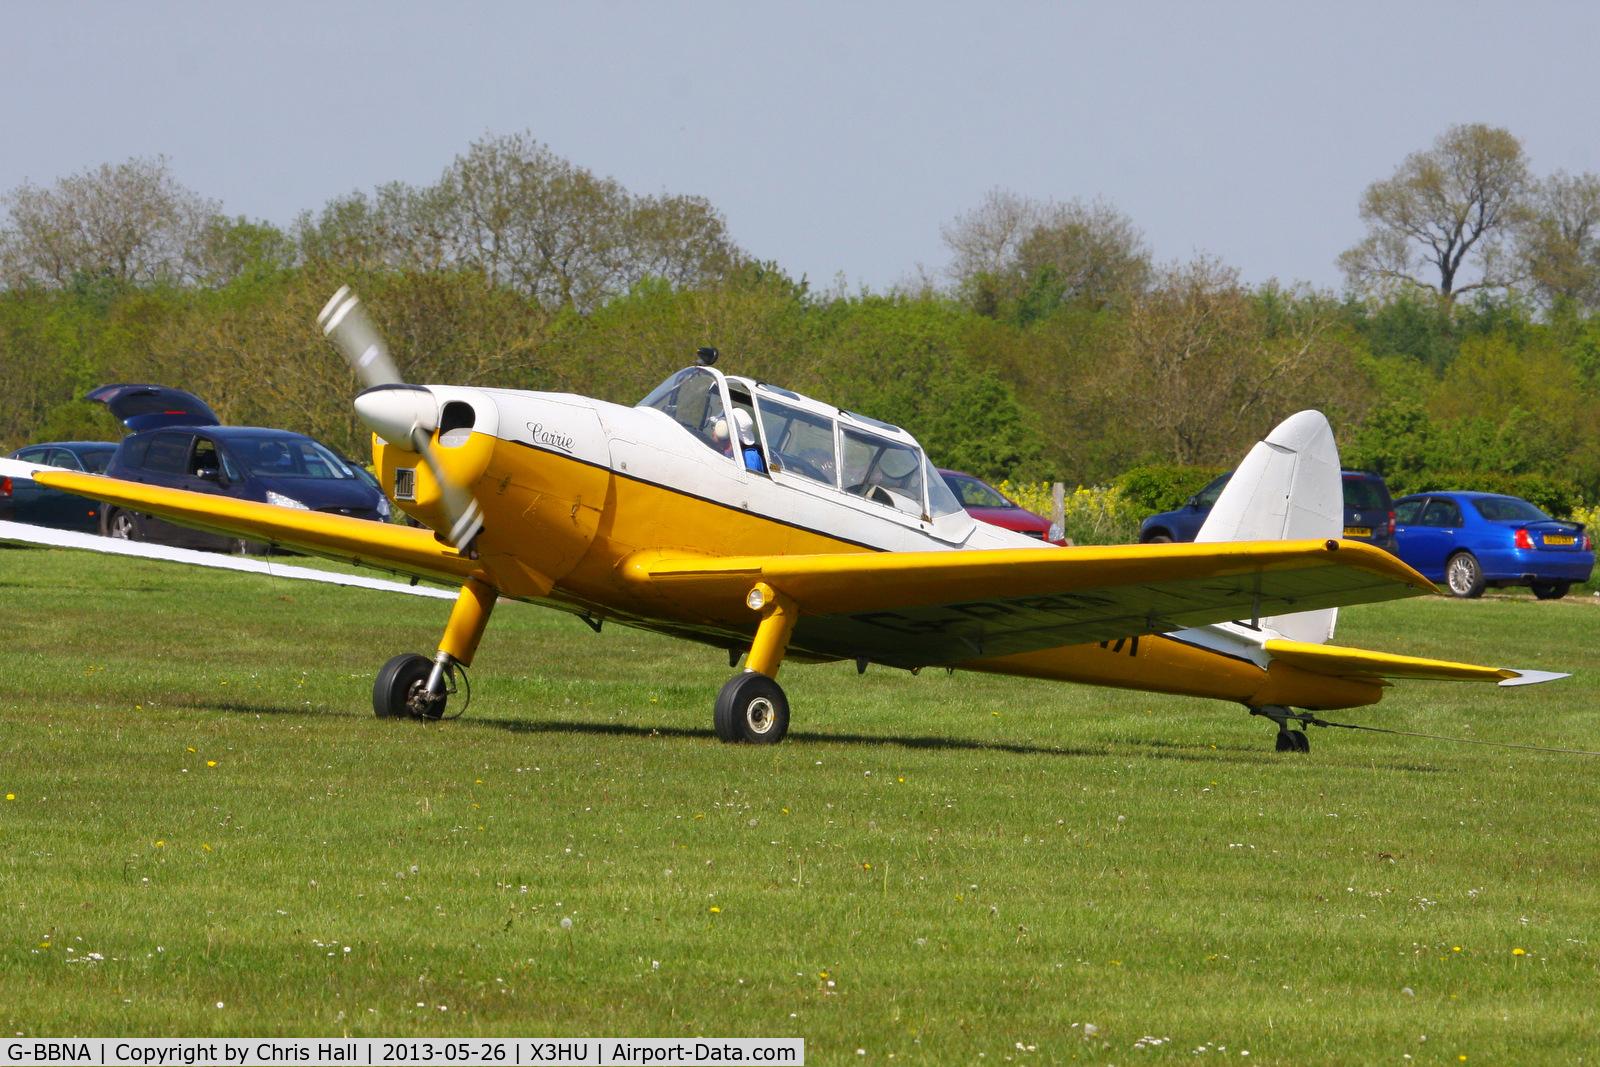 G-BBNA, 1953 De Havilland DHC-1 Chipmunk 22 (Lycoming) C/N C1/0491, Coventry Gliding Club, Husbands Bosworth